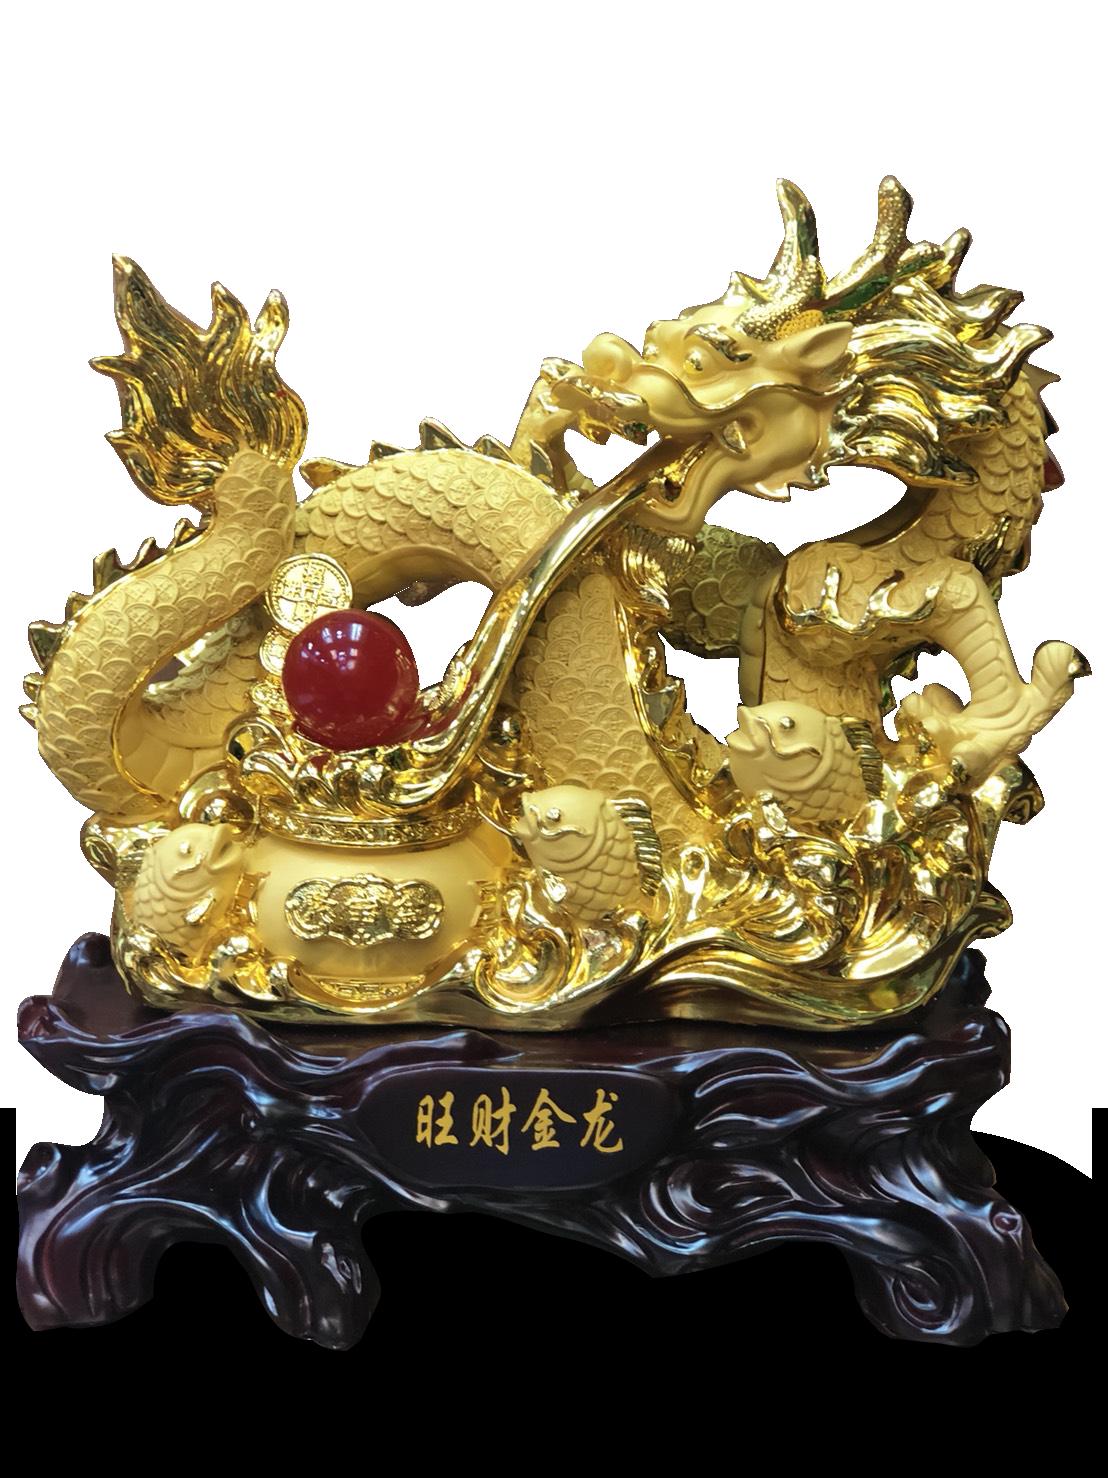 agiftinabox-dragon